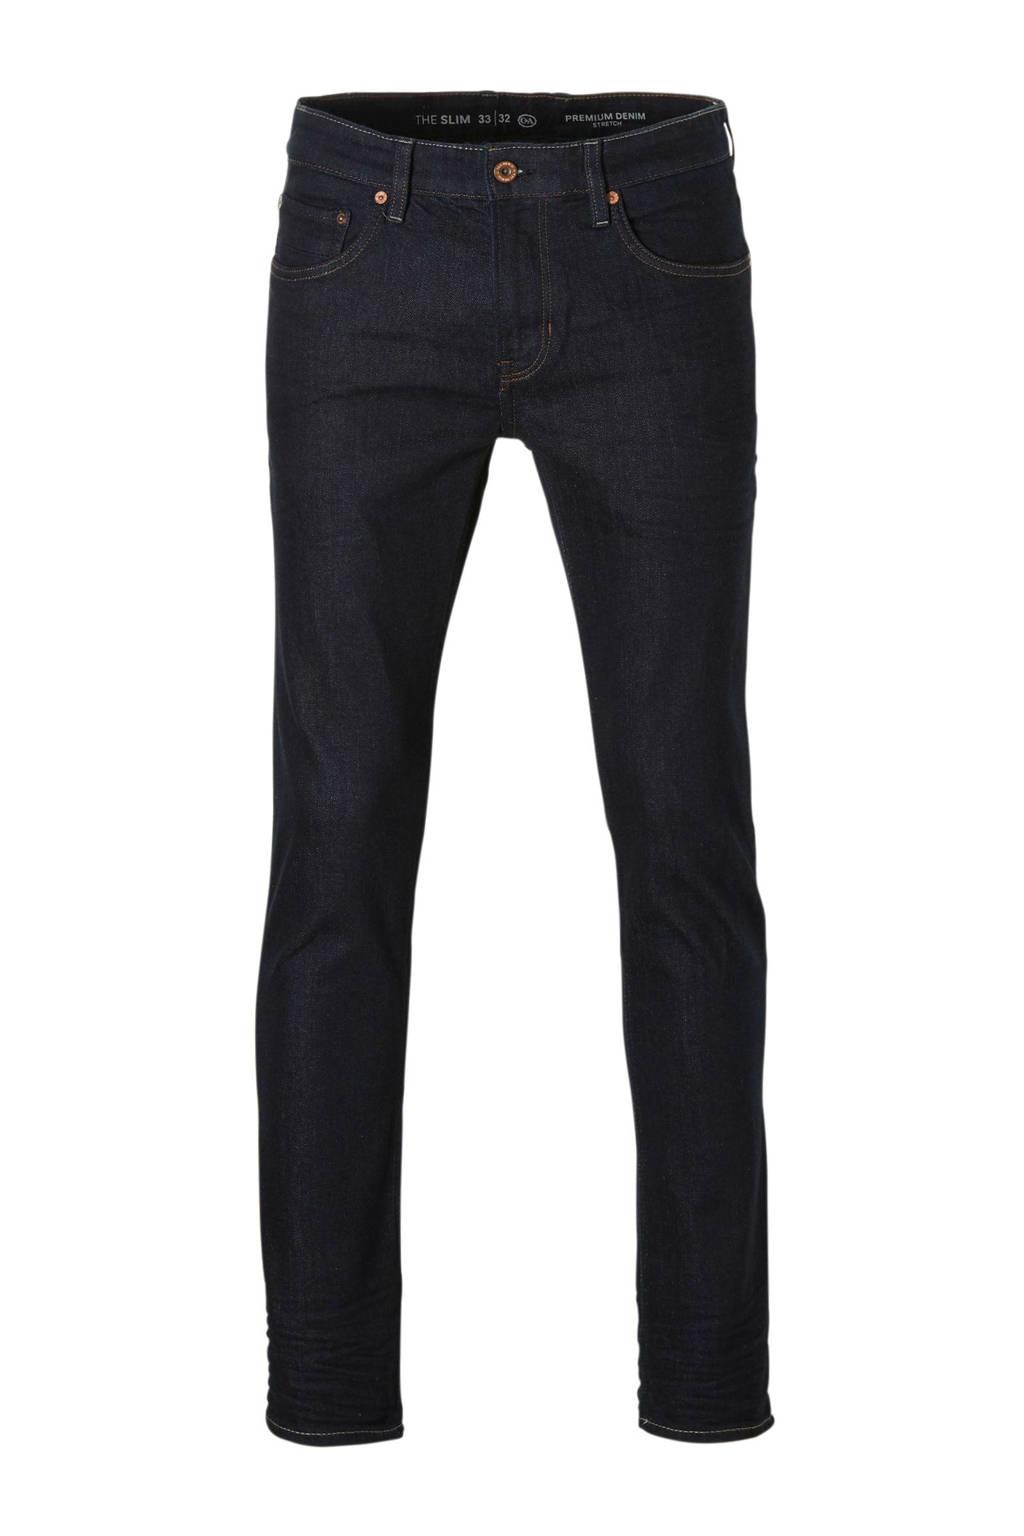 C&A The Denim slim fit jeans, Dark denim